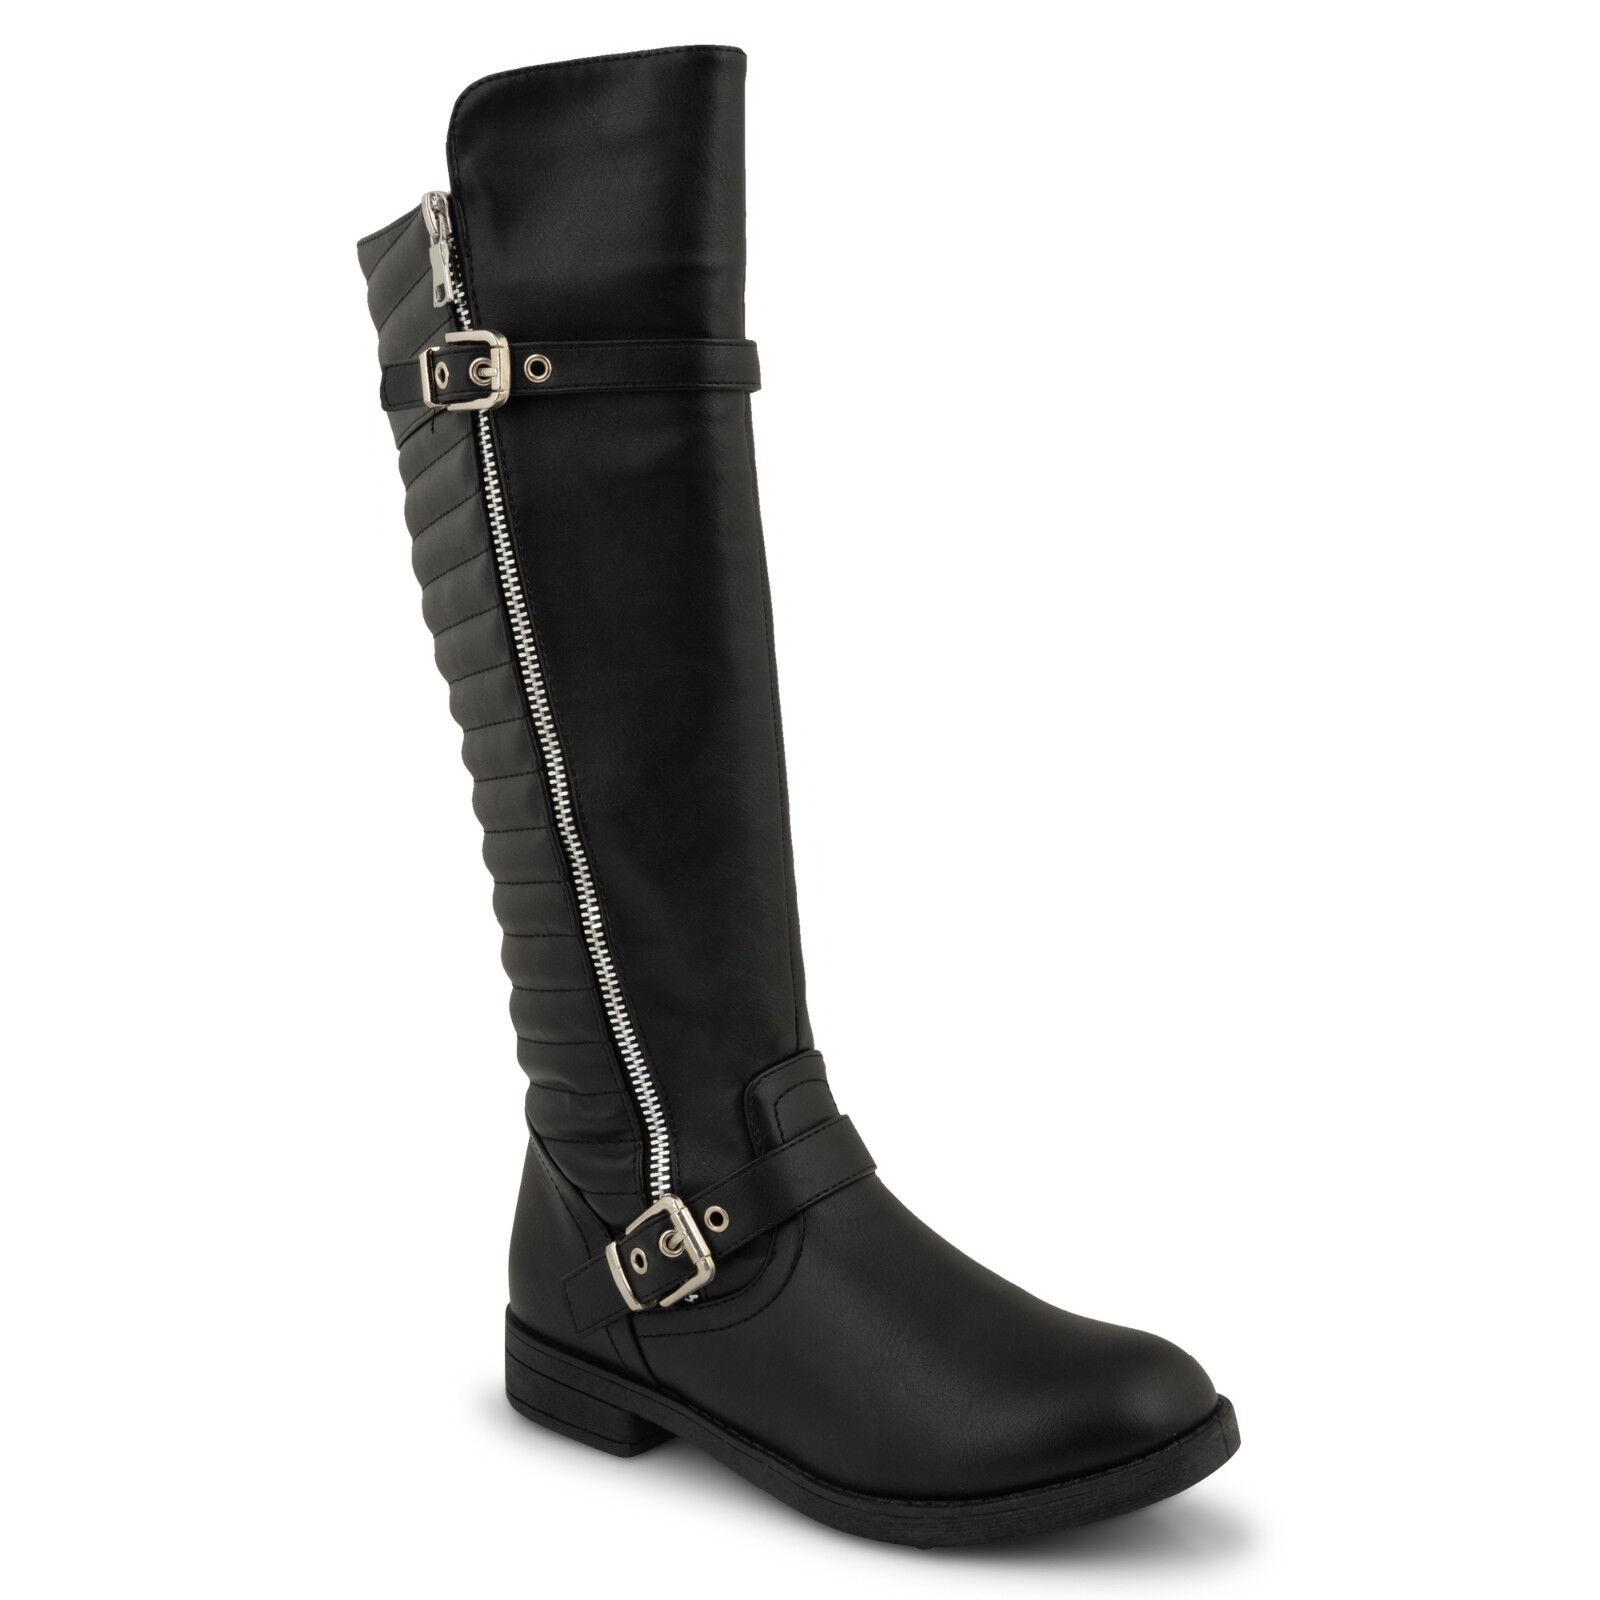 Womens Ladies Low Flat Heel Knee High Boots Black Zipped -4297